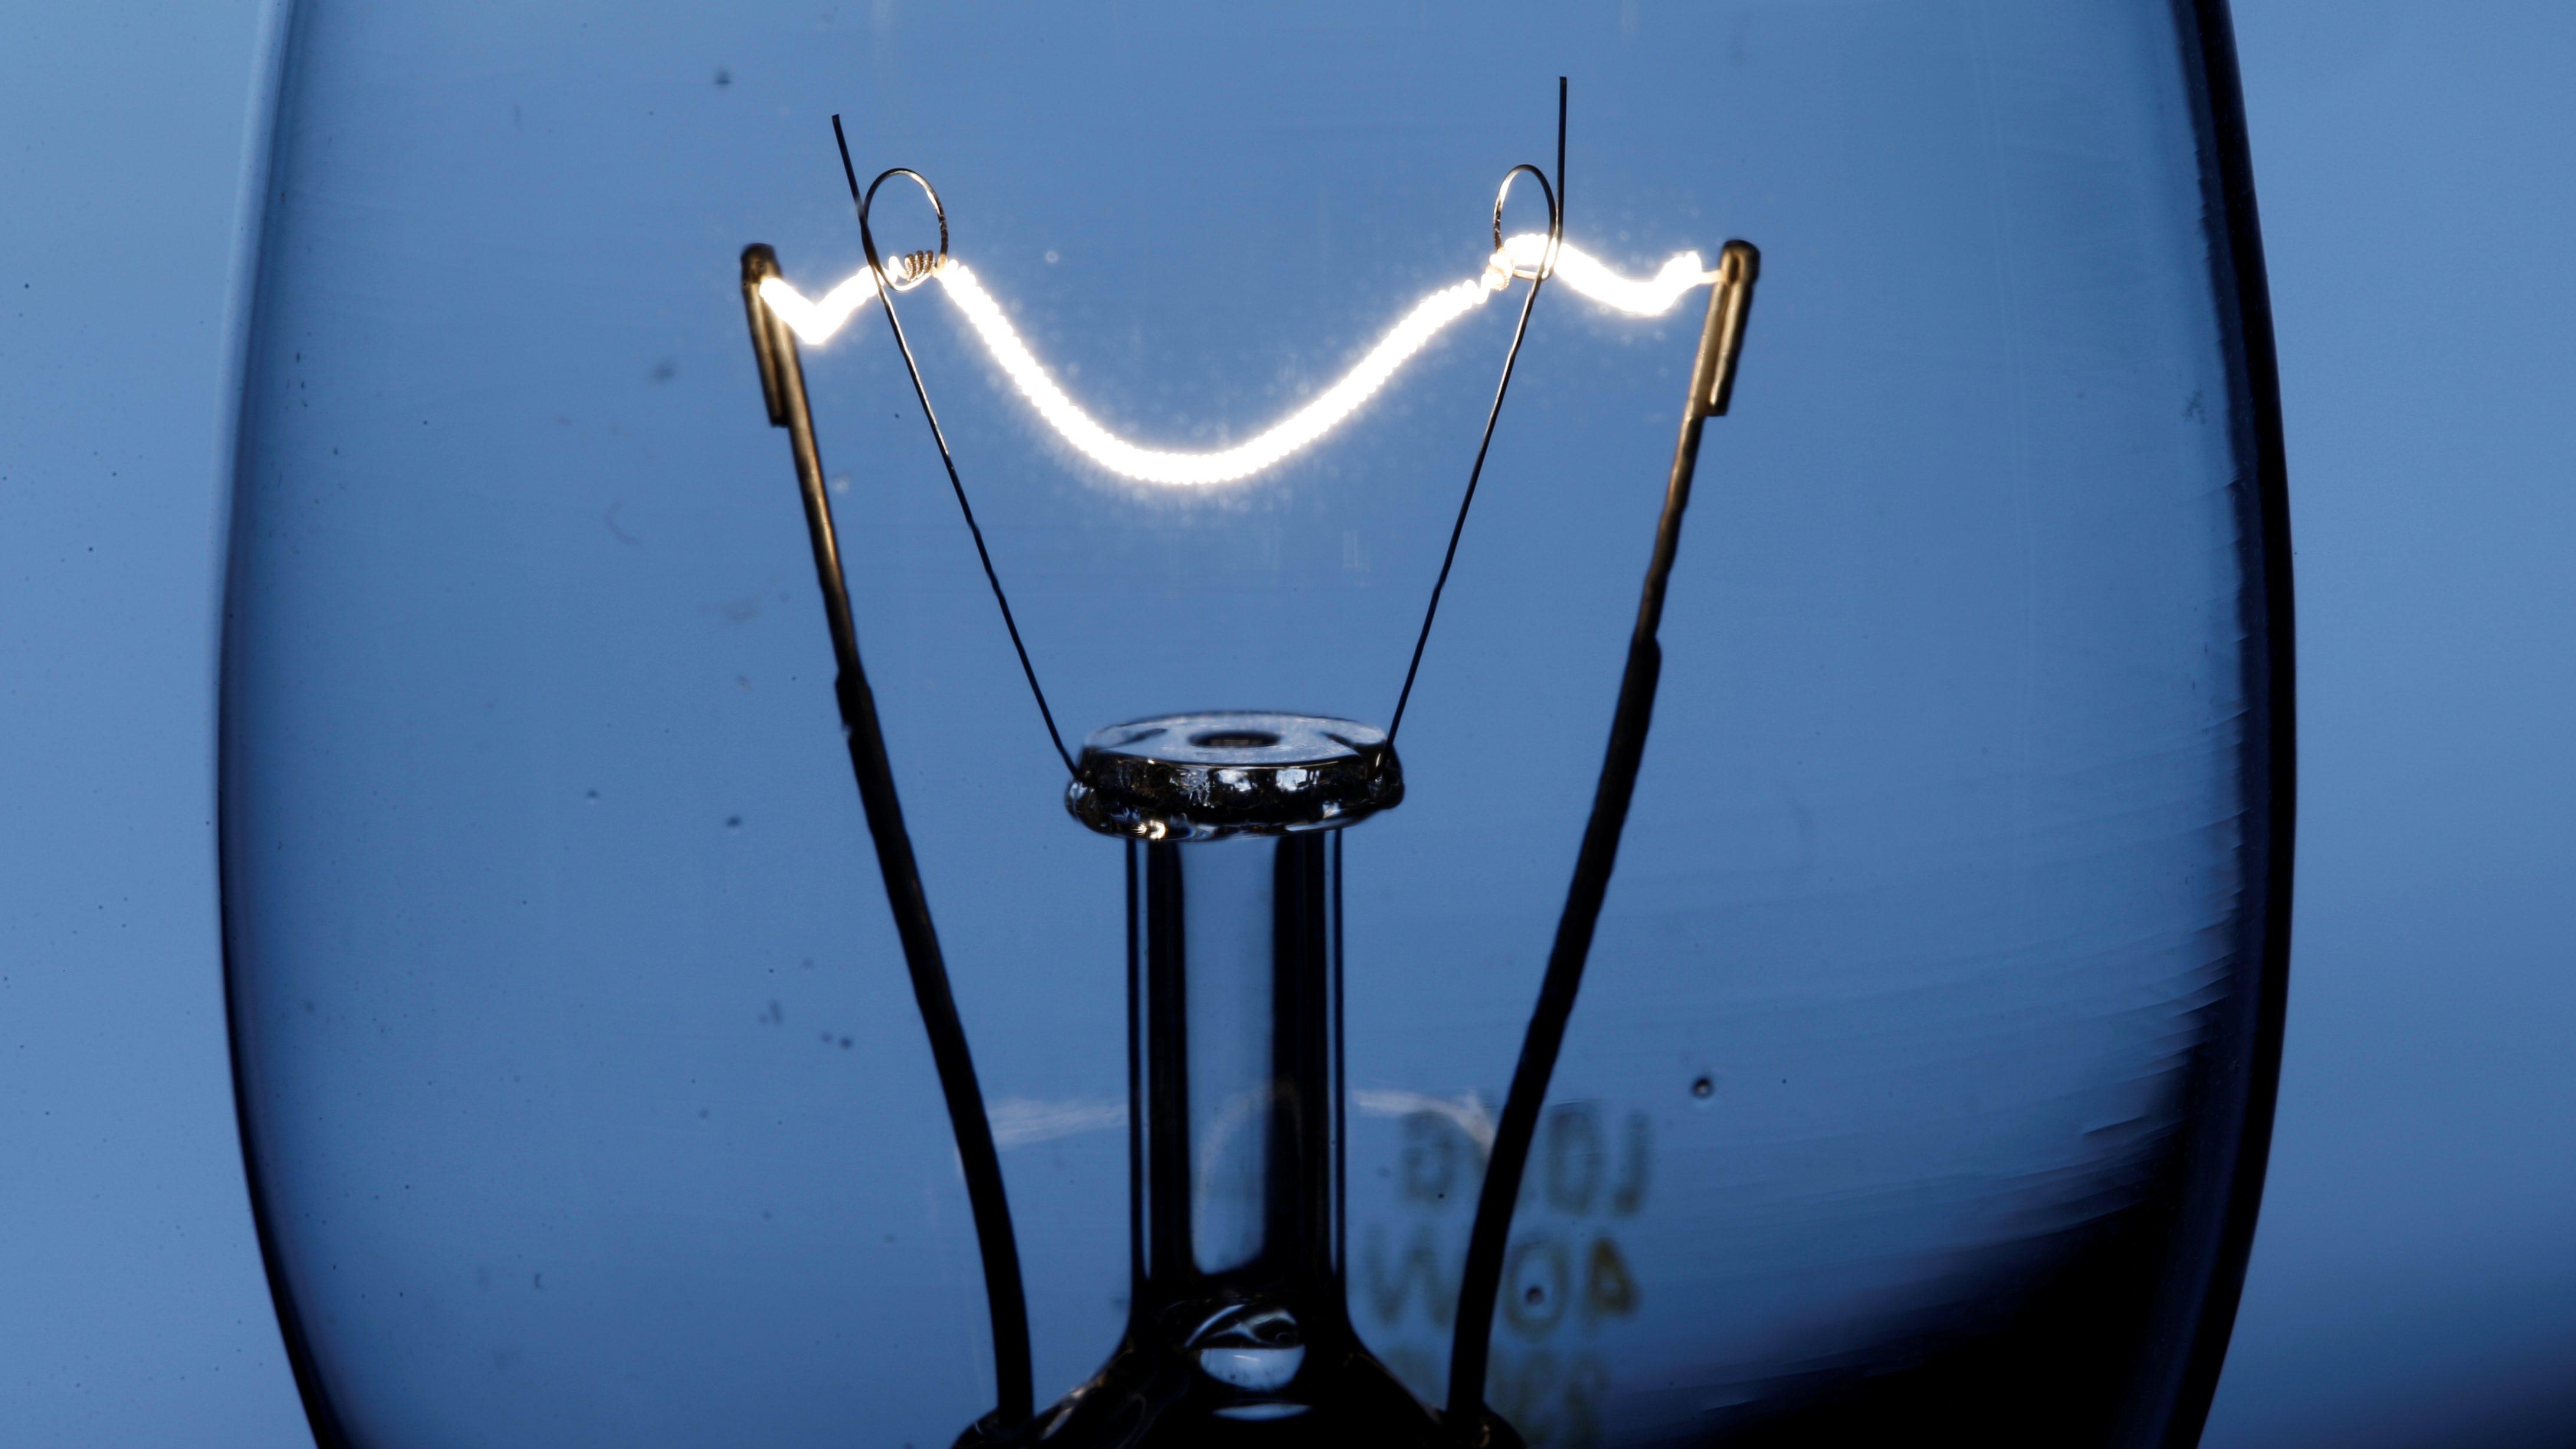 The filament of an incandescent light bulb